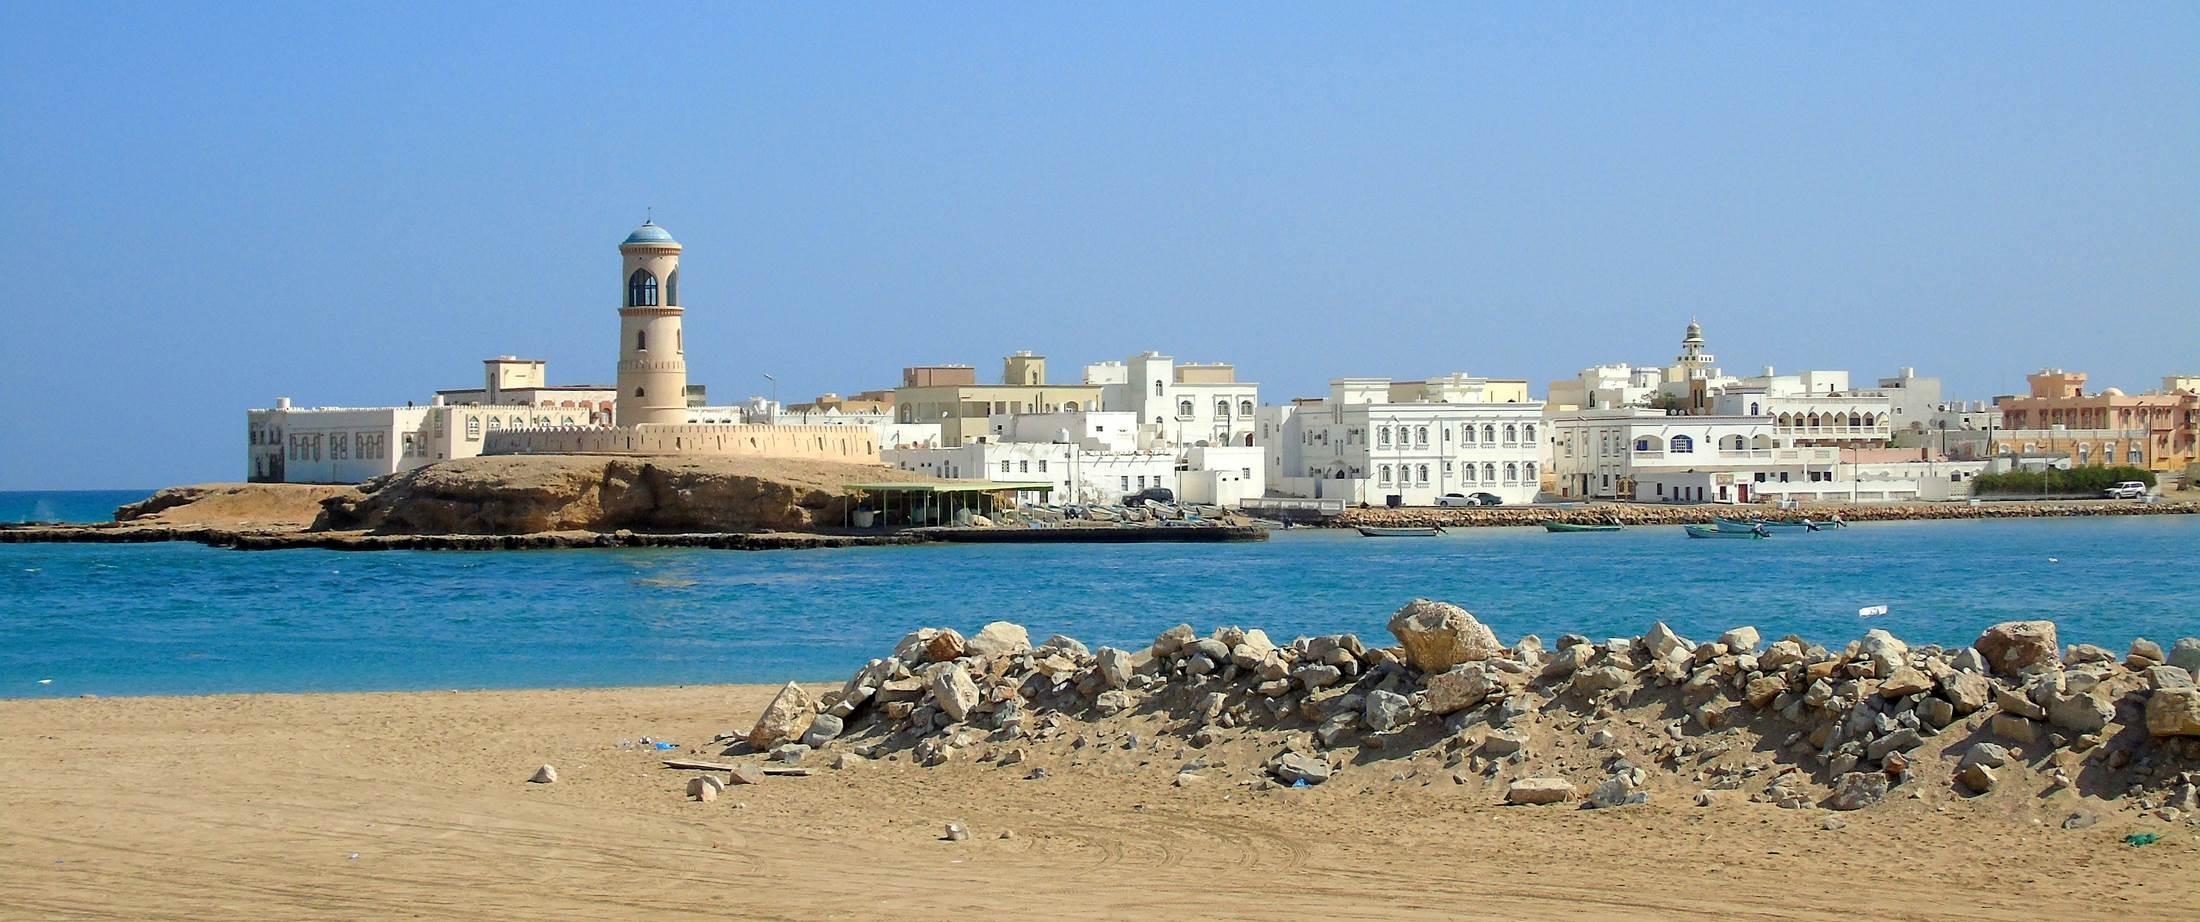 Oman Architektura Tradycja